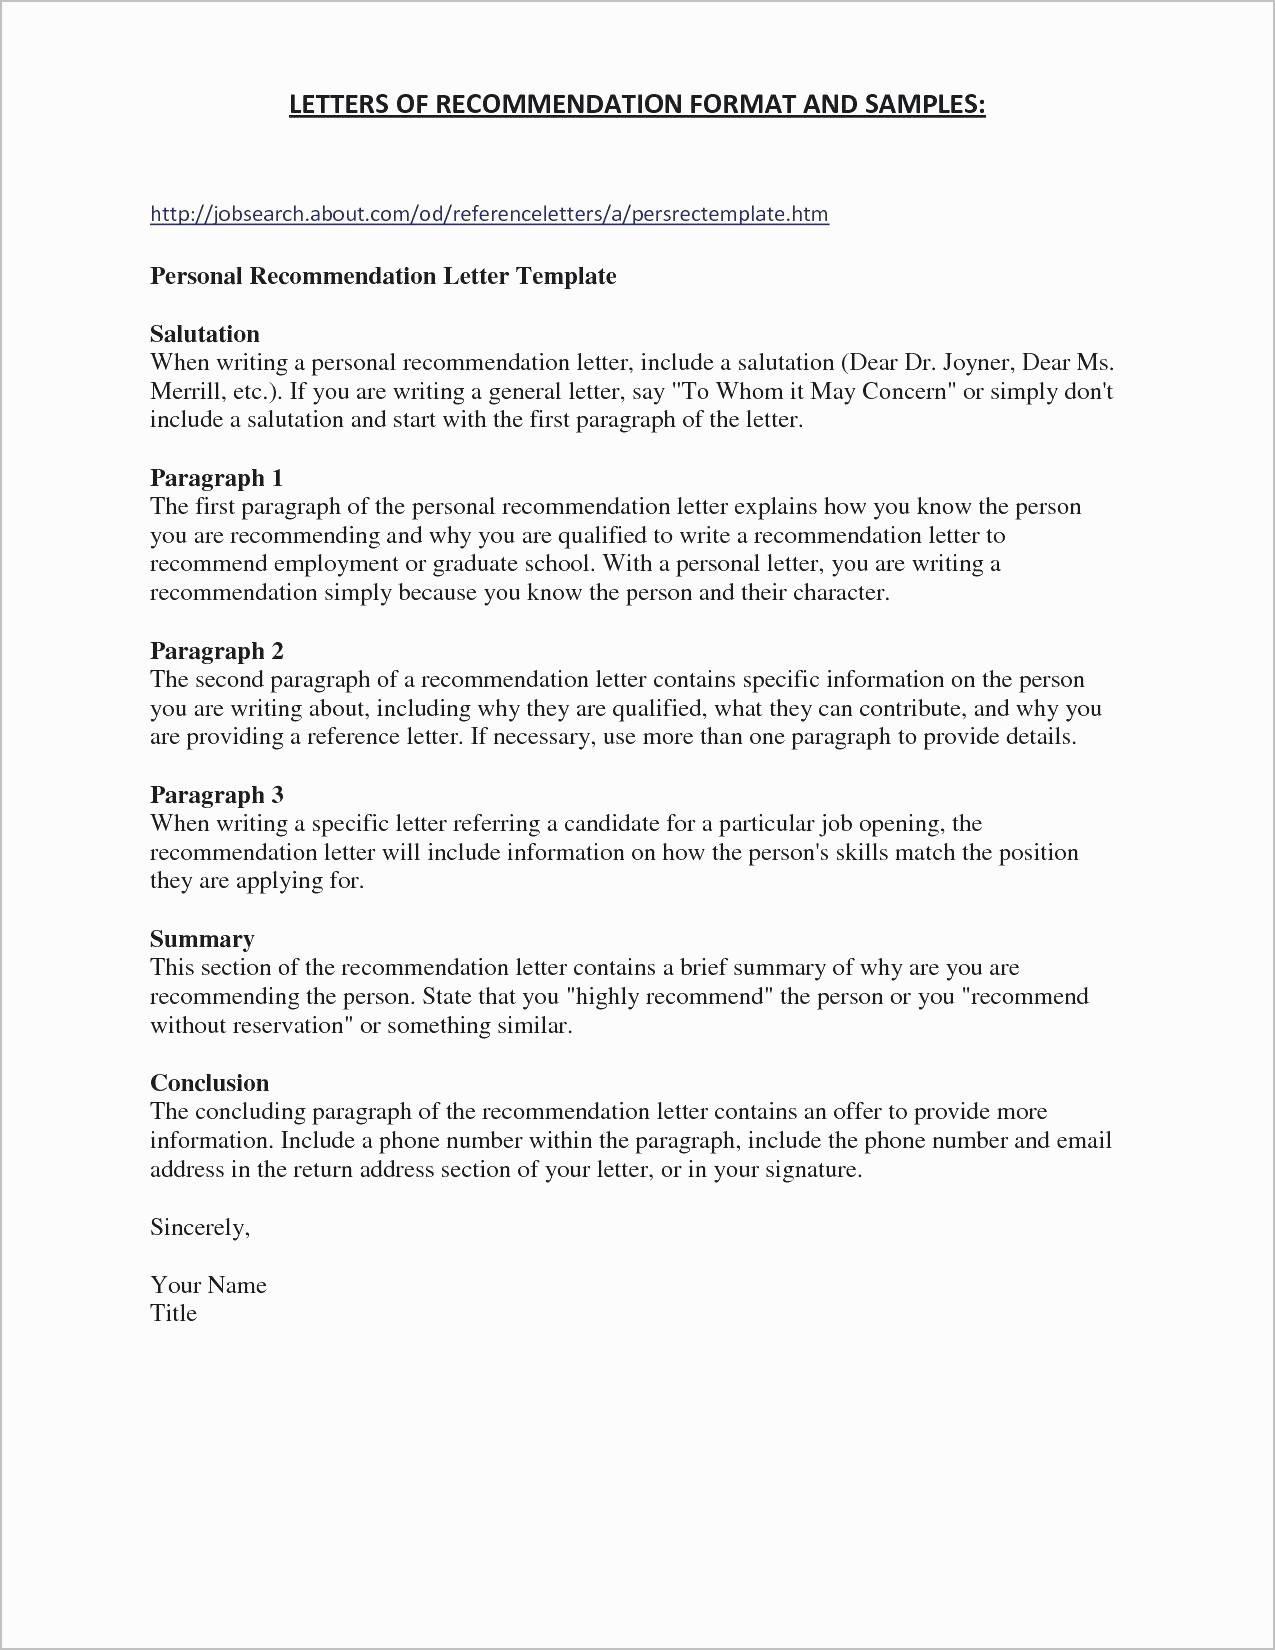 Letter Of Transmittal Template Construction - Sample Transmittal form Template Beautiful Construction Transmittal